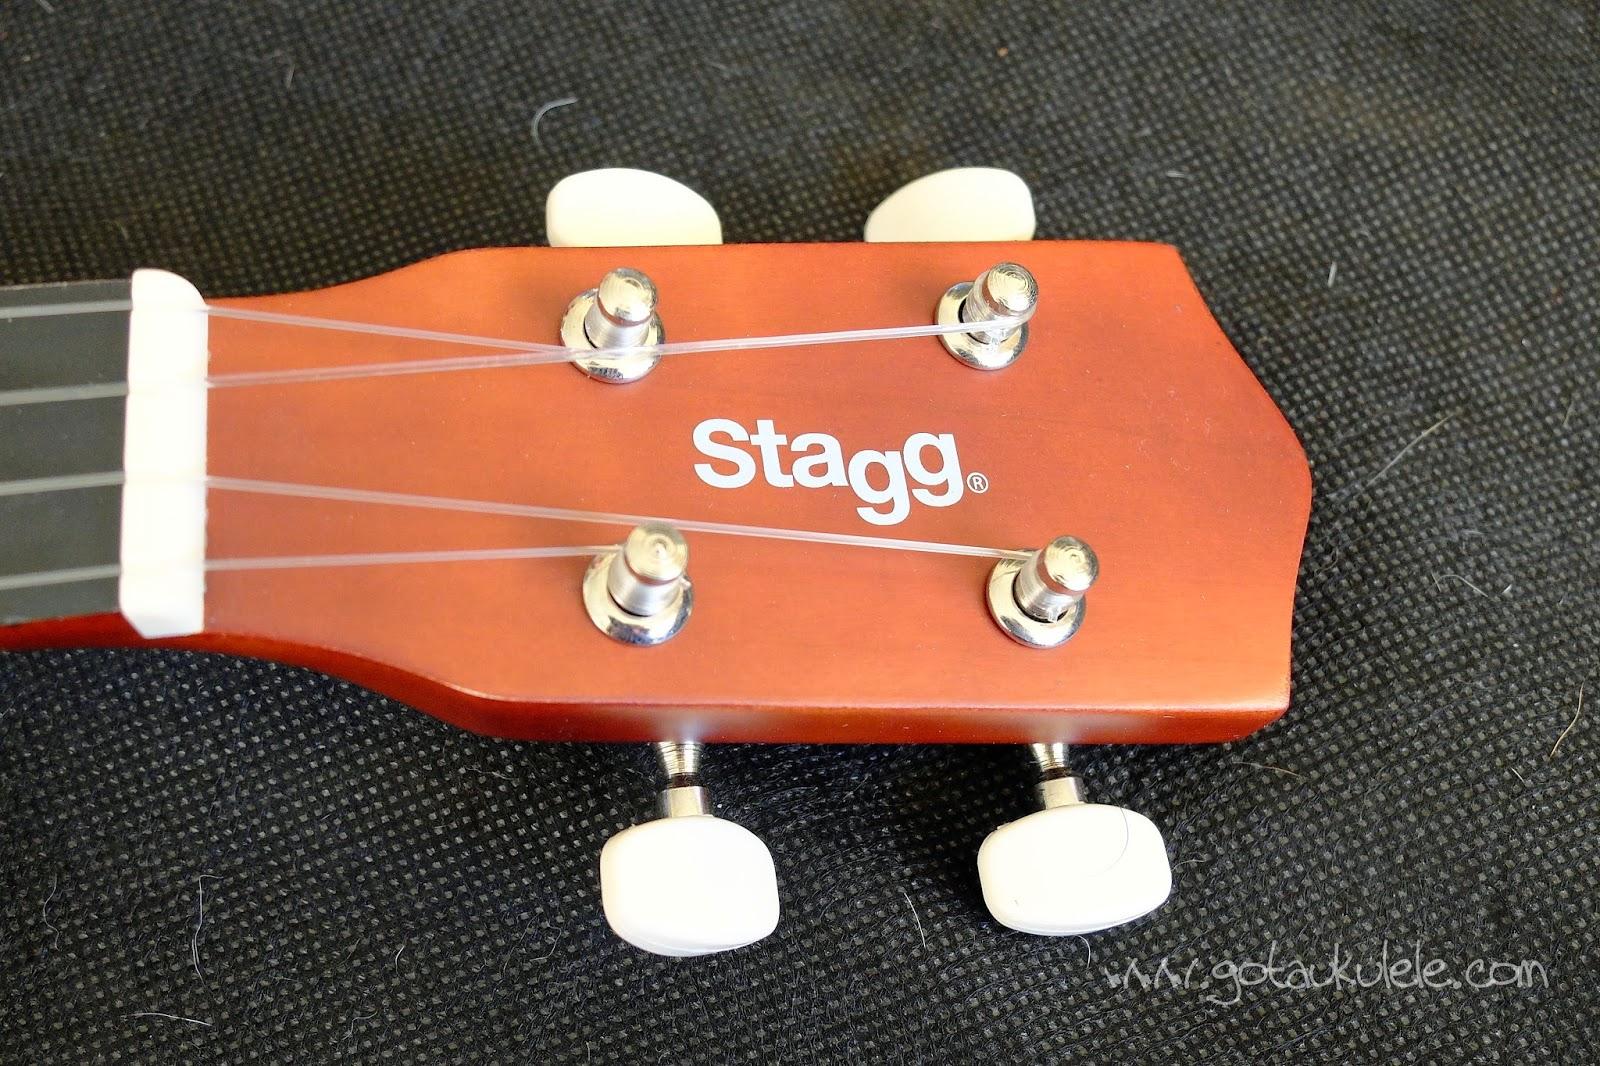 Stagg US10 Soprano Ukulele headstock